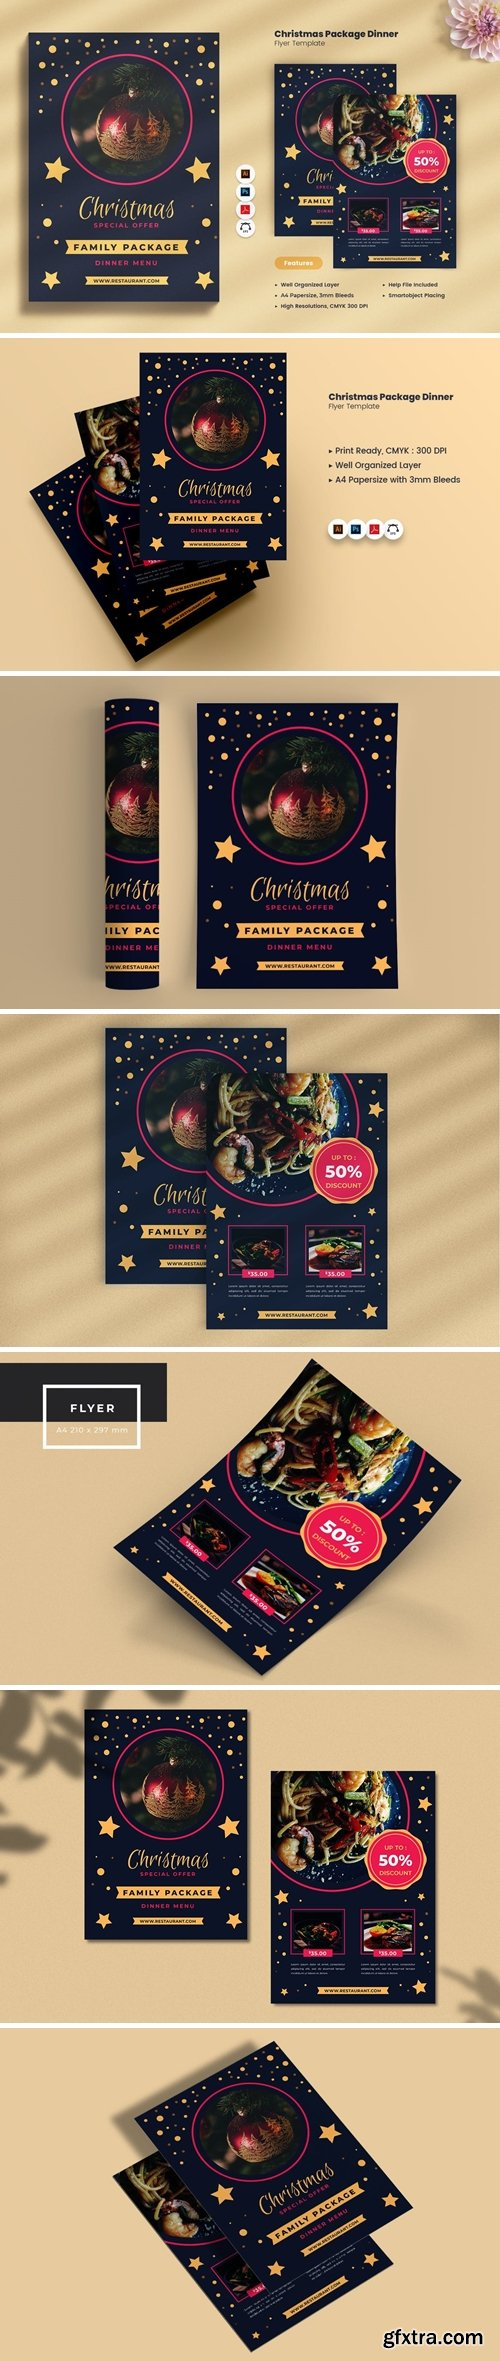 Christmas Eve Package Dinner Flyer